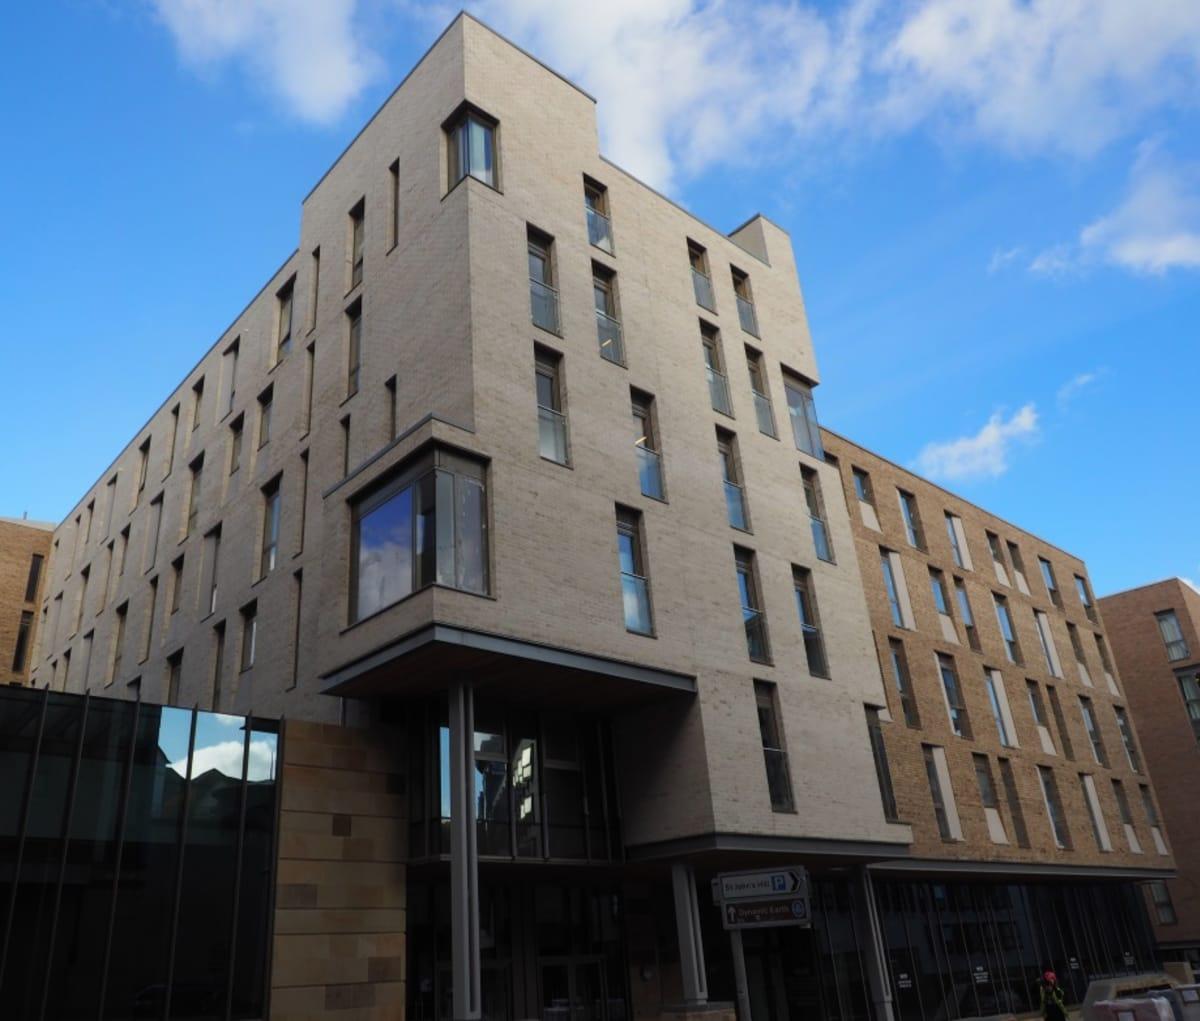 35,000 facing bricks used to create accommodation in Holyrood, Edinburgh